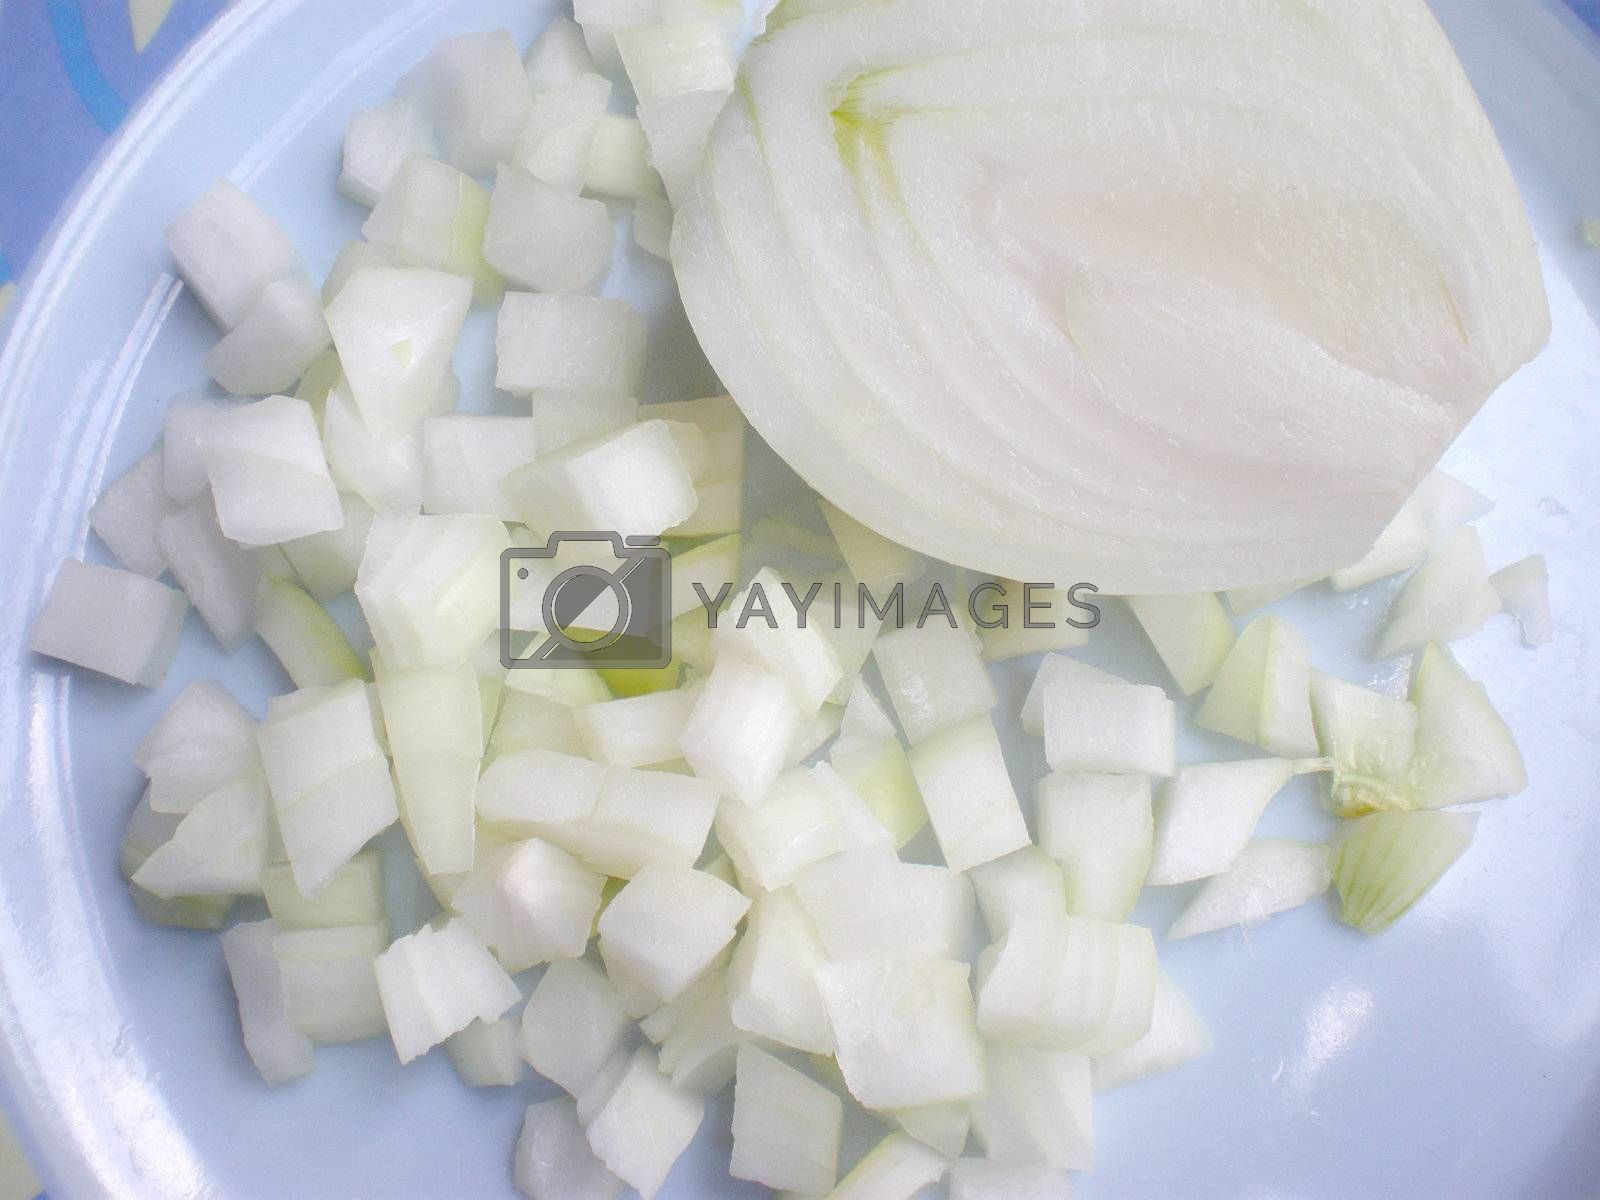 Royalty free image of onion by Dessie_bg